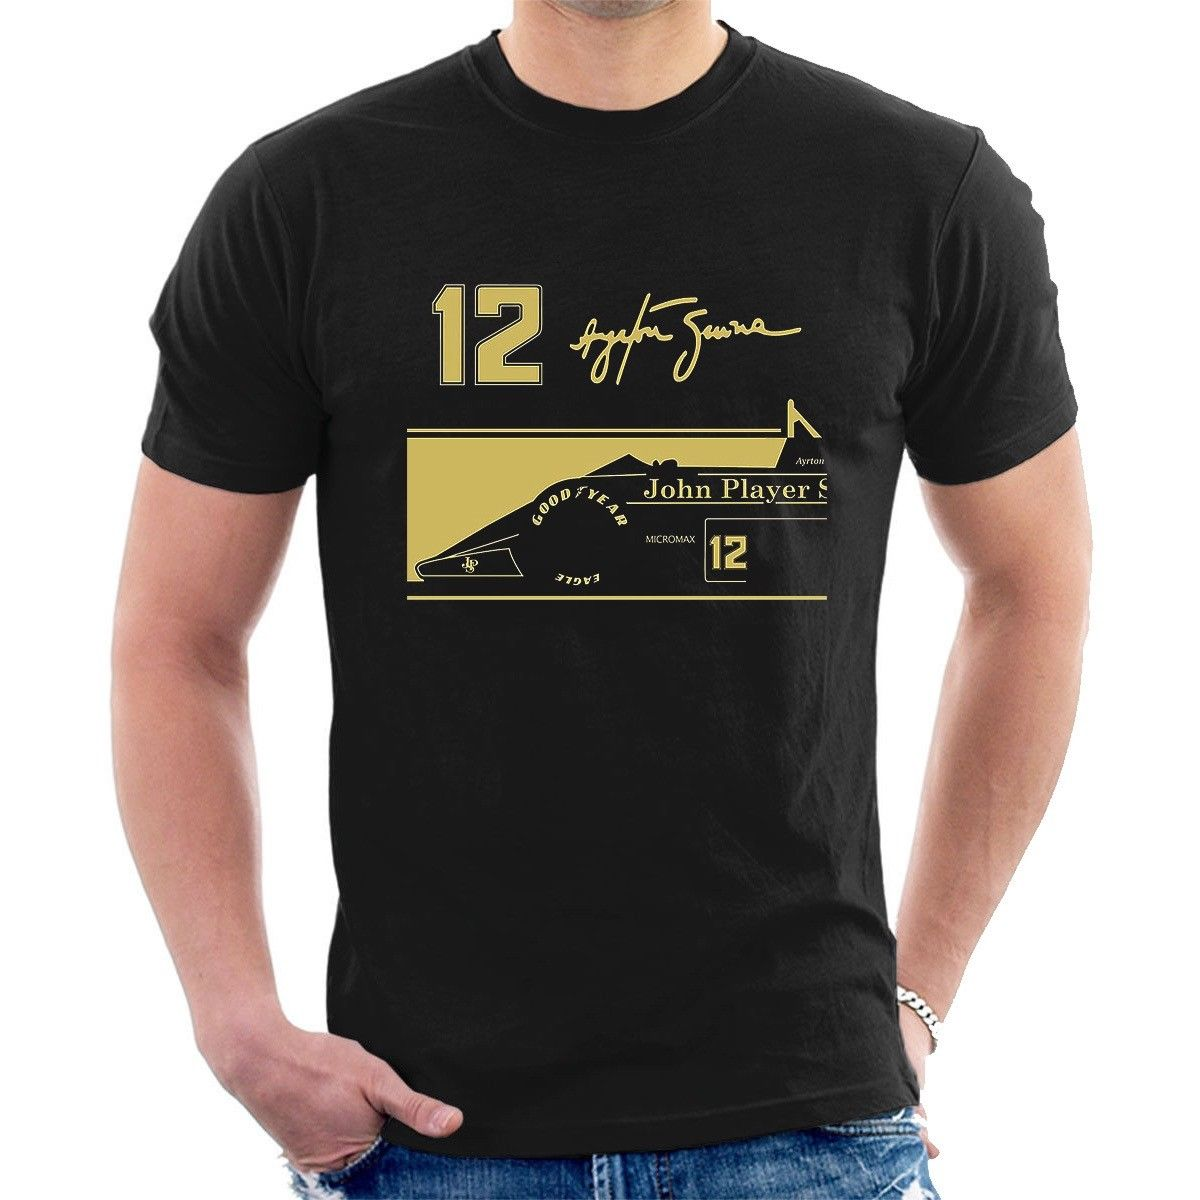 2019 New Fashion Casual Men T Shirt Novelty O-Neck Tops Ayrton Senna Jps Tribute T-Shirt 12 Signature Bulk T Shirts